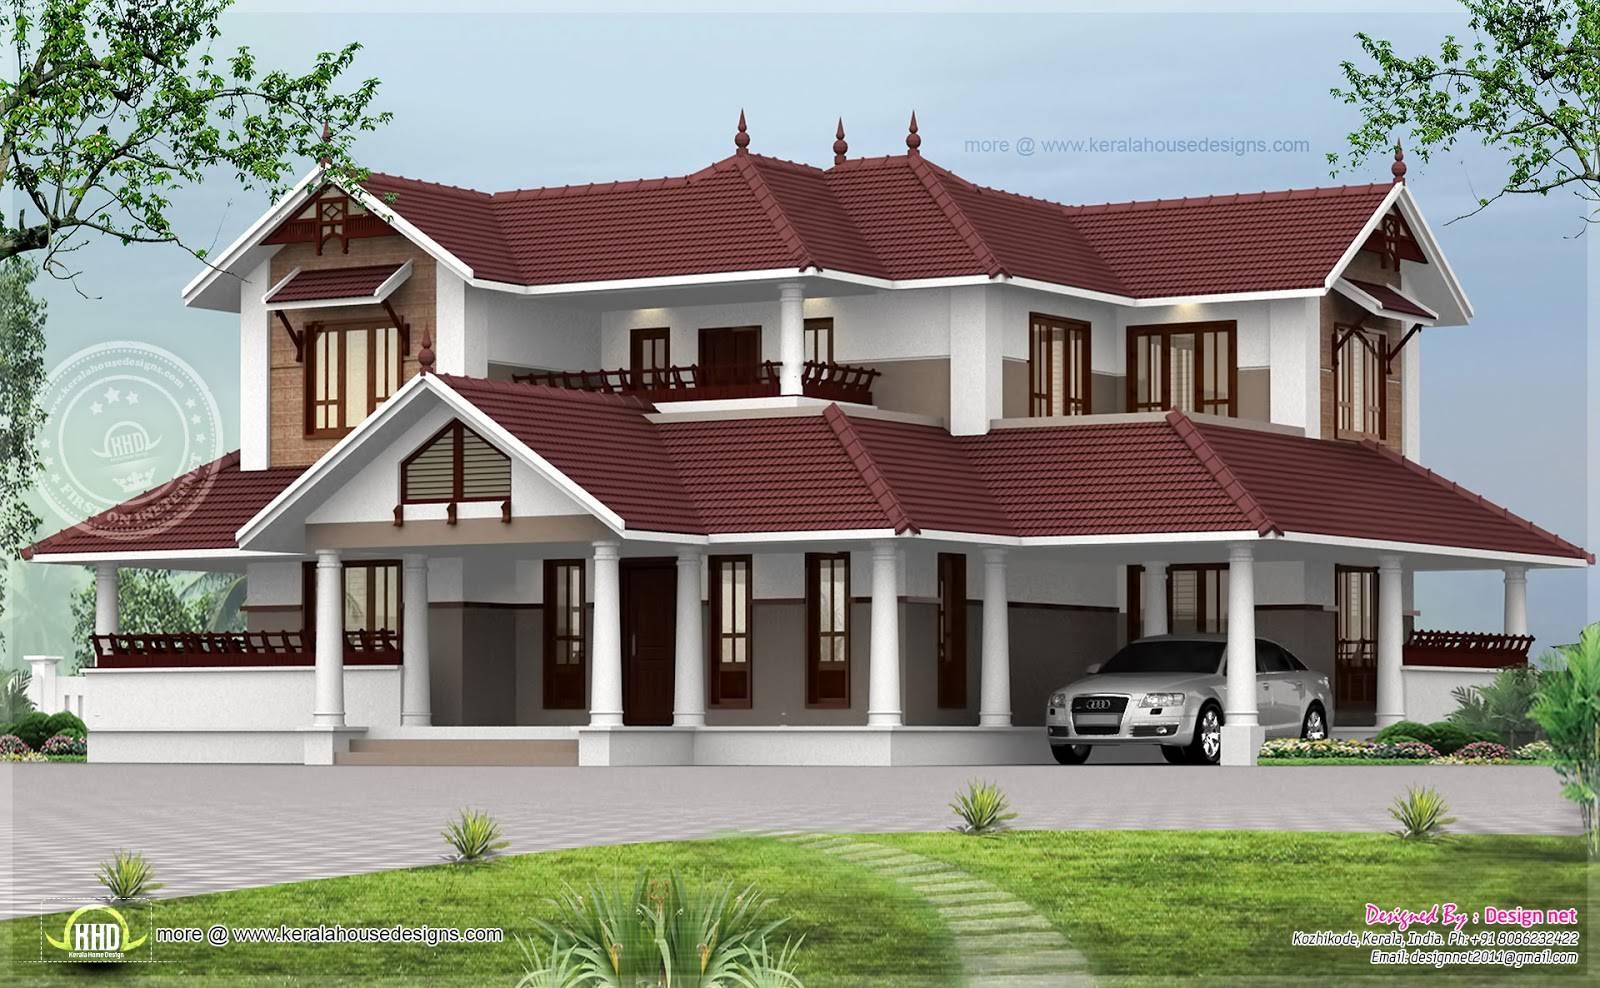 House exterior design pictures kerala for Exterior design company